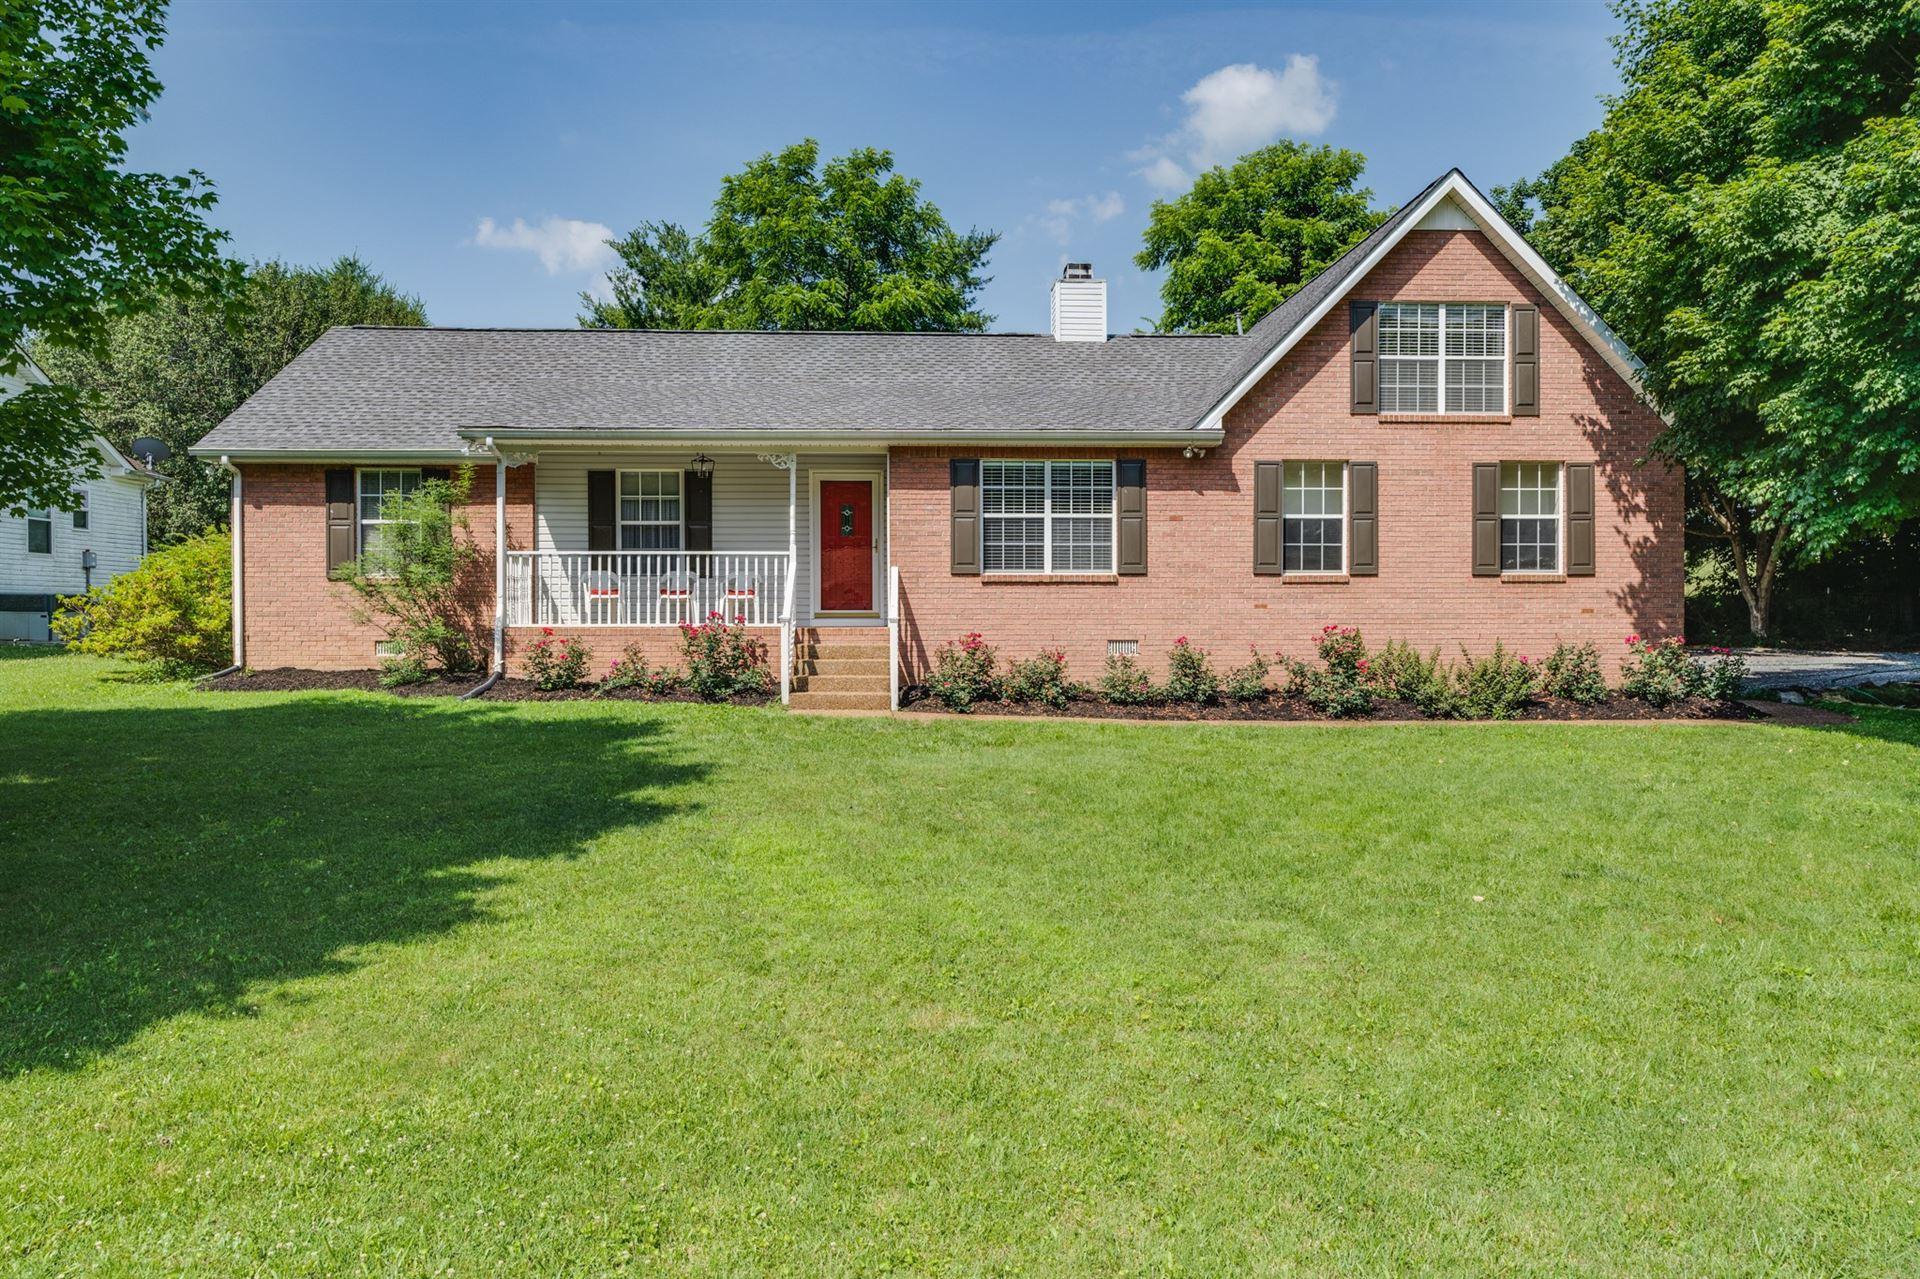 211 Beechbrook Ct, White House, TN 37188 - MLS#: 2264185